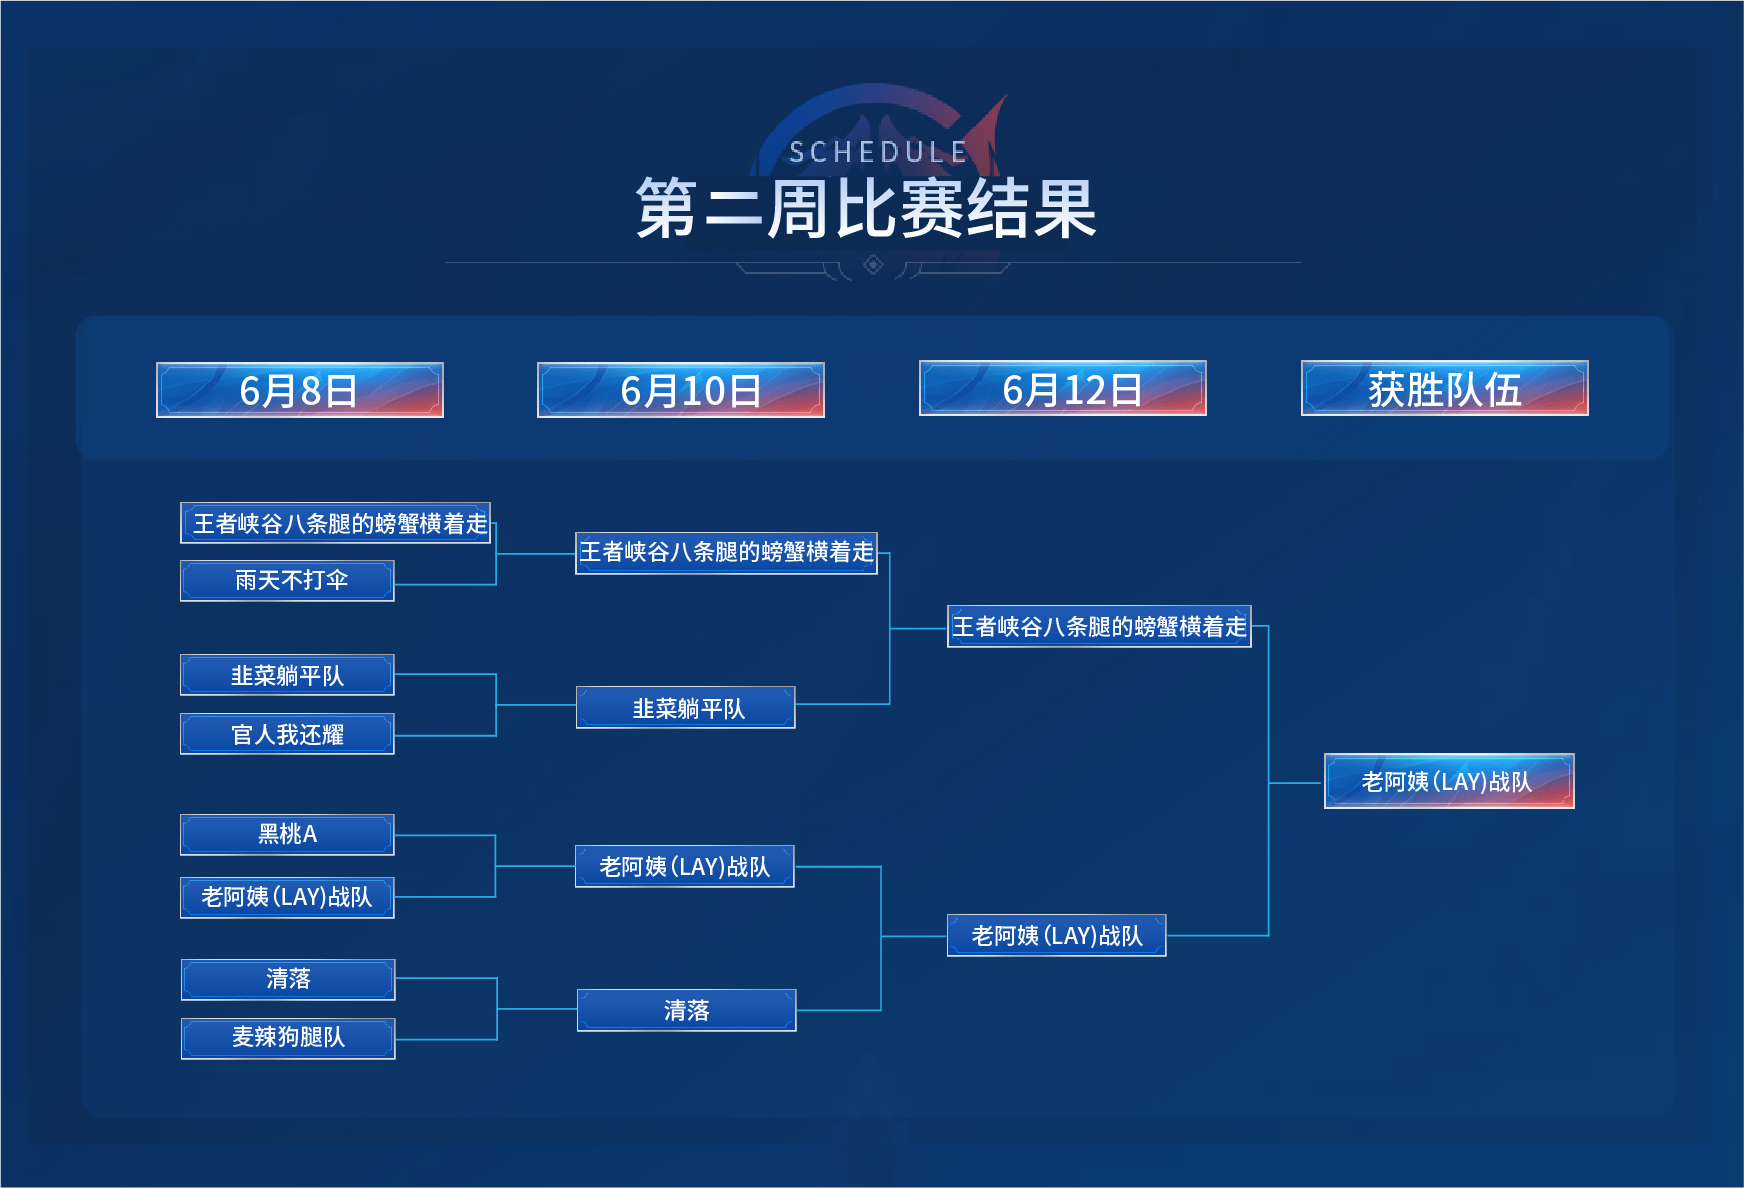 Gate.io 直播间王者荣耀大赛第三季第三周比赛开启暨次周获胜队伍公布公告